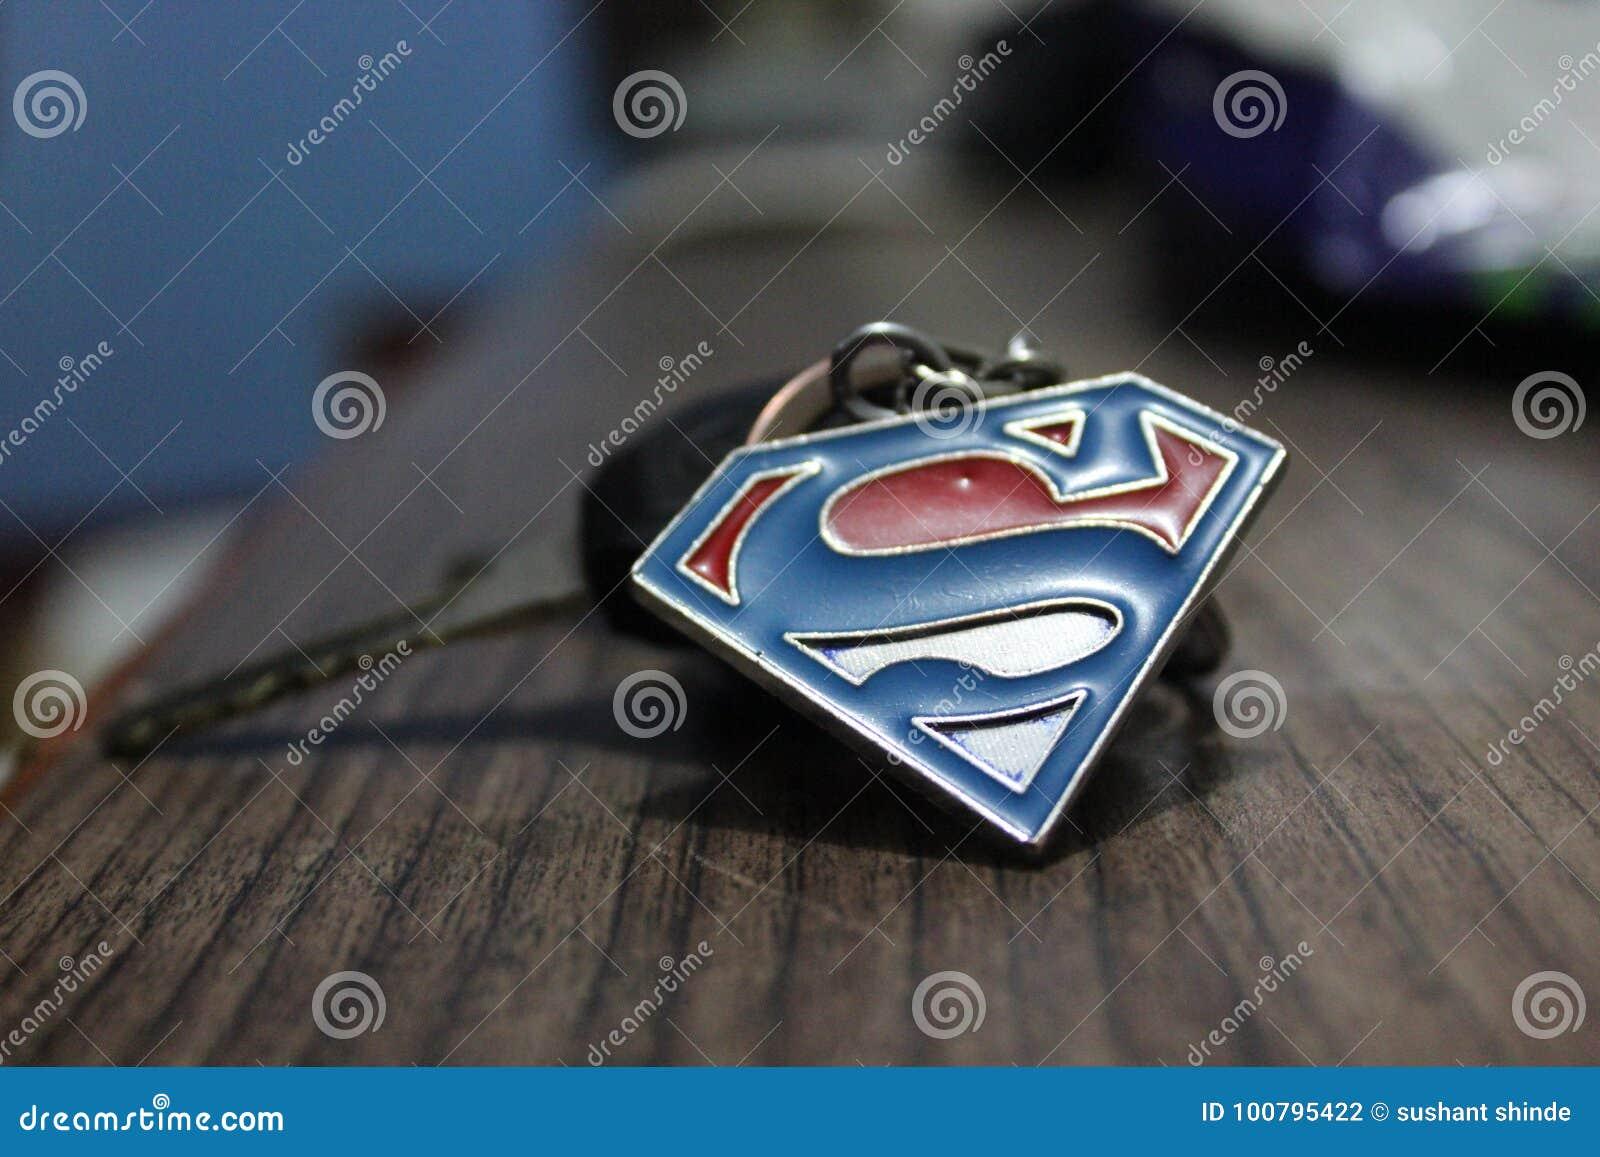 Superman Editorial Photography Image Of Yamaha Keychain 100795422